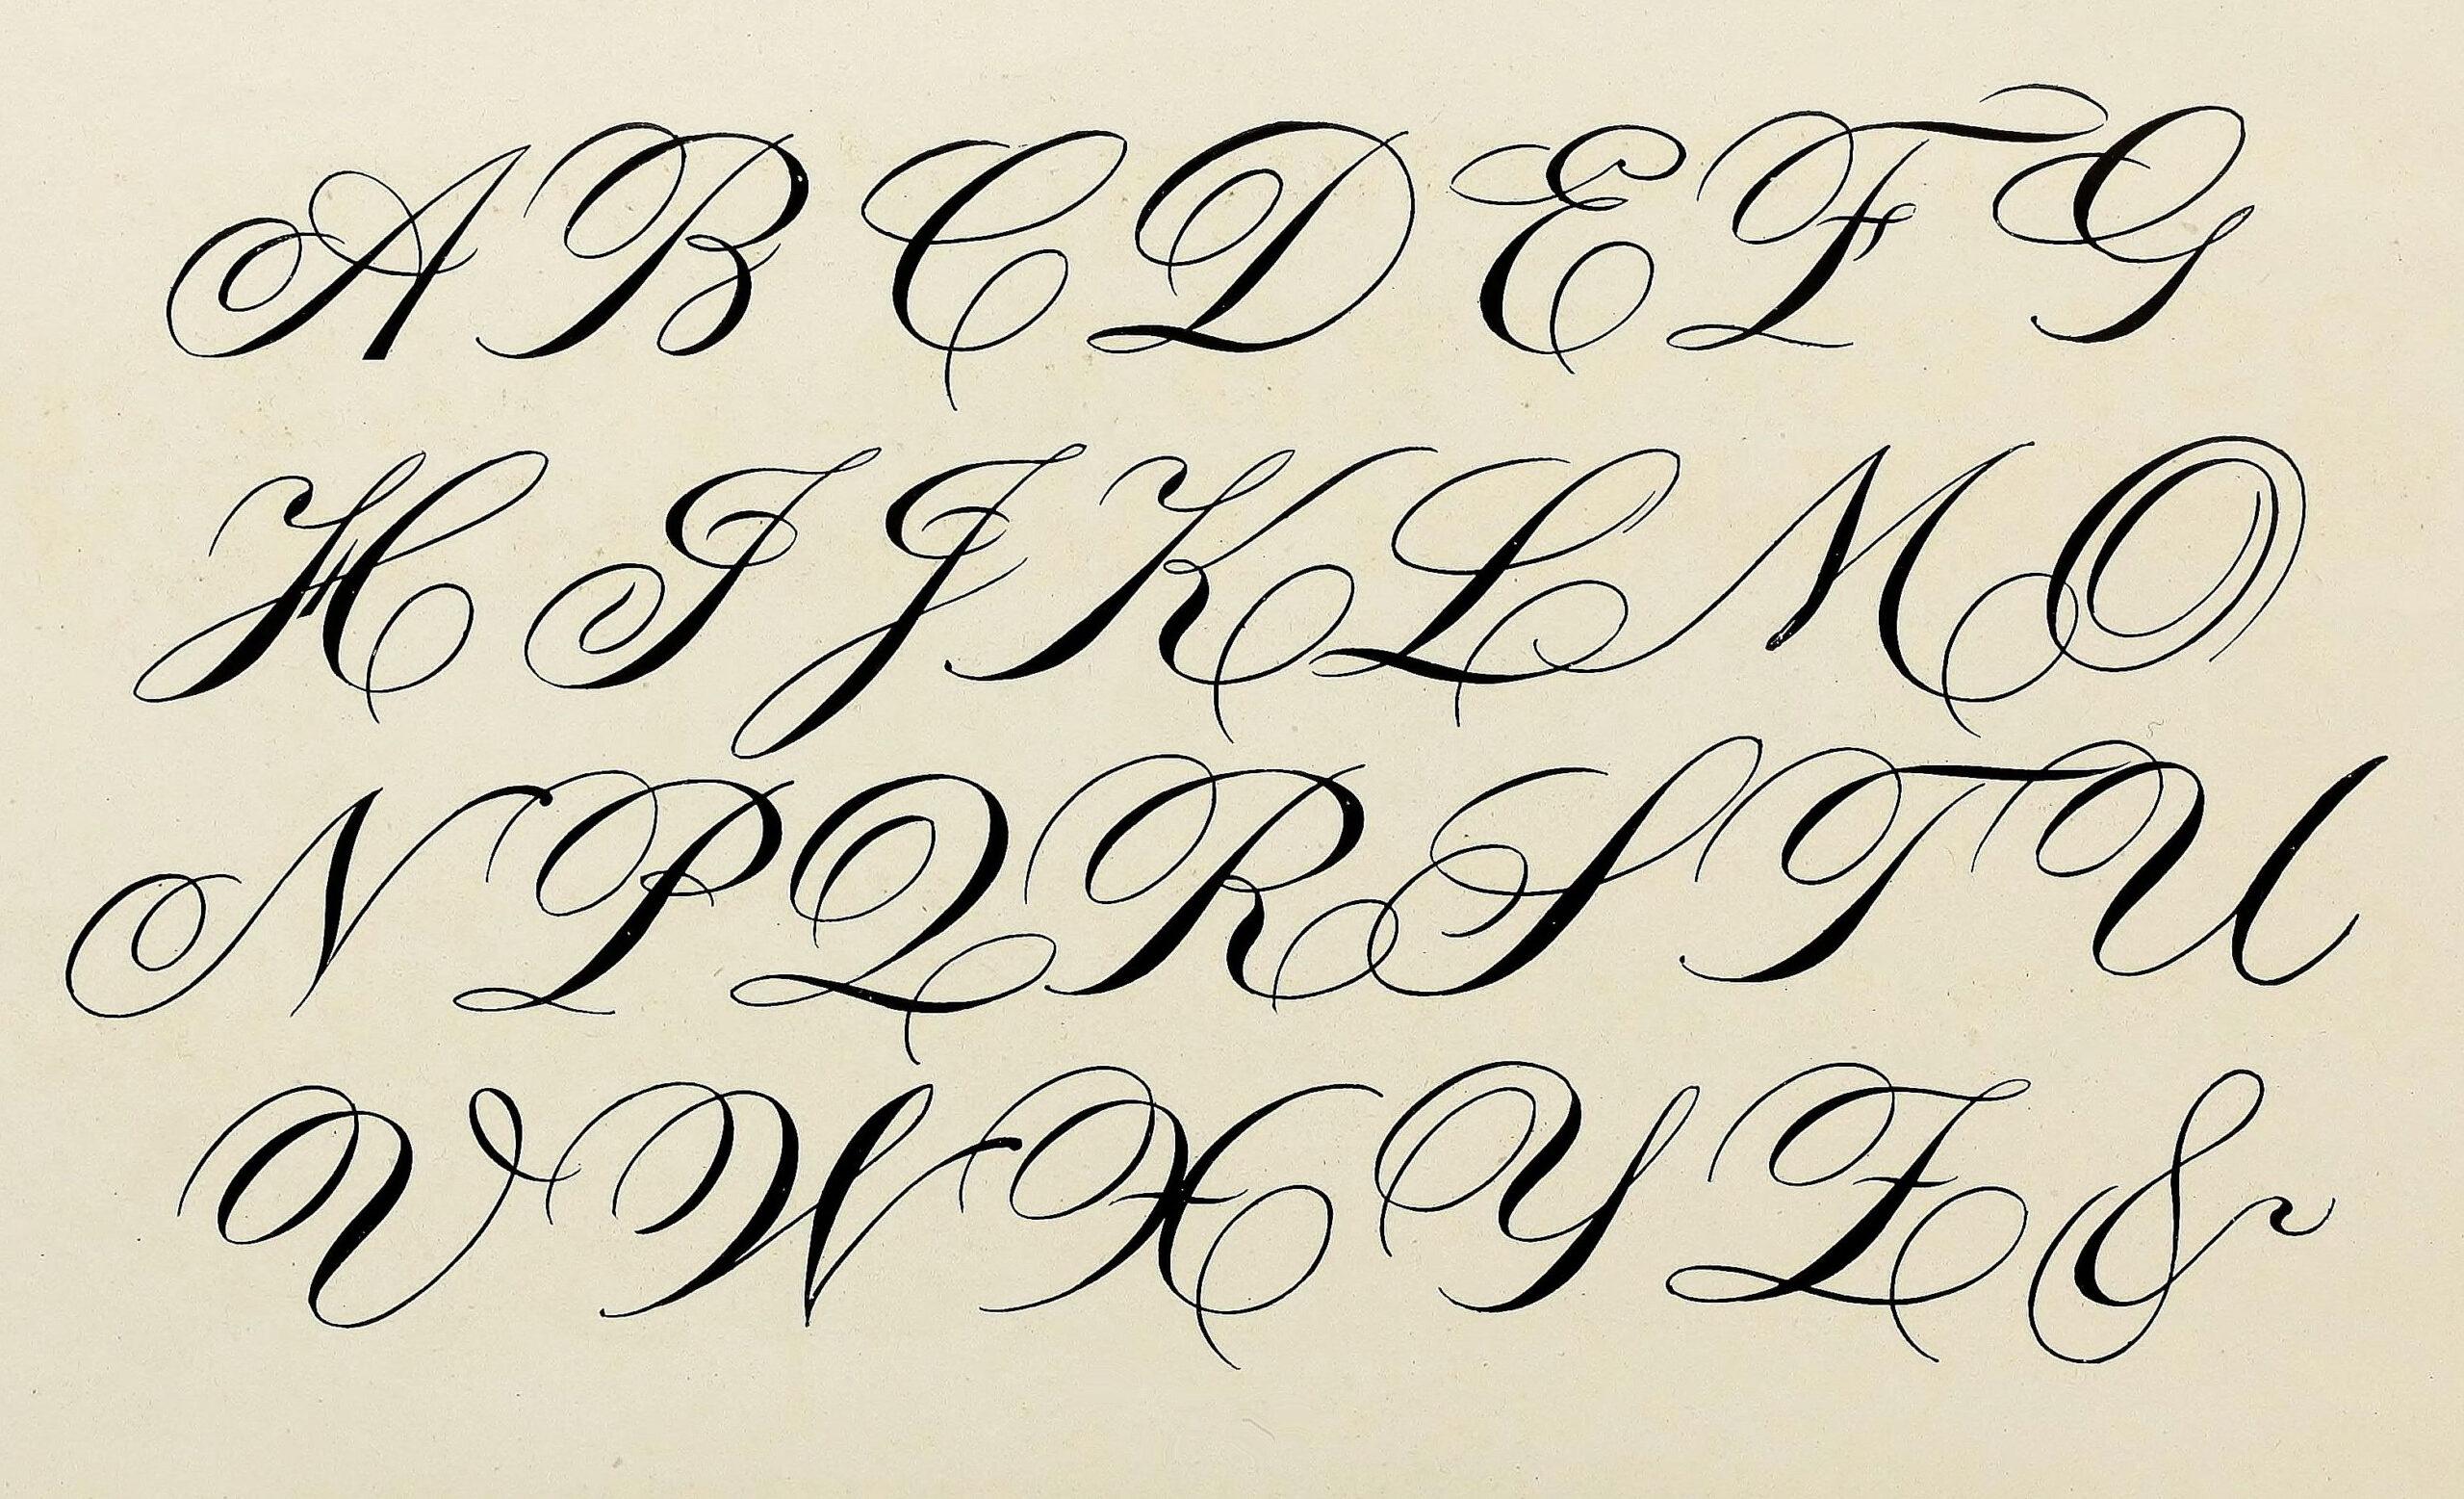 Lettering Design ,calligraphy Design, Cursive Calligraphy